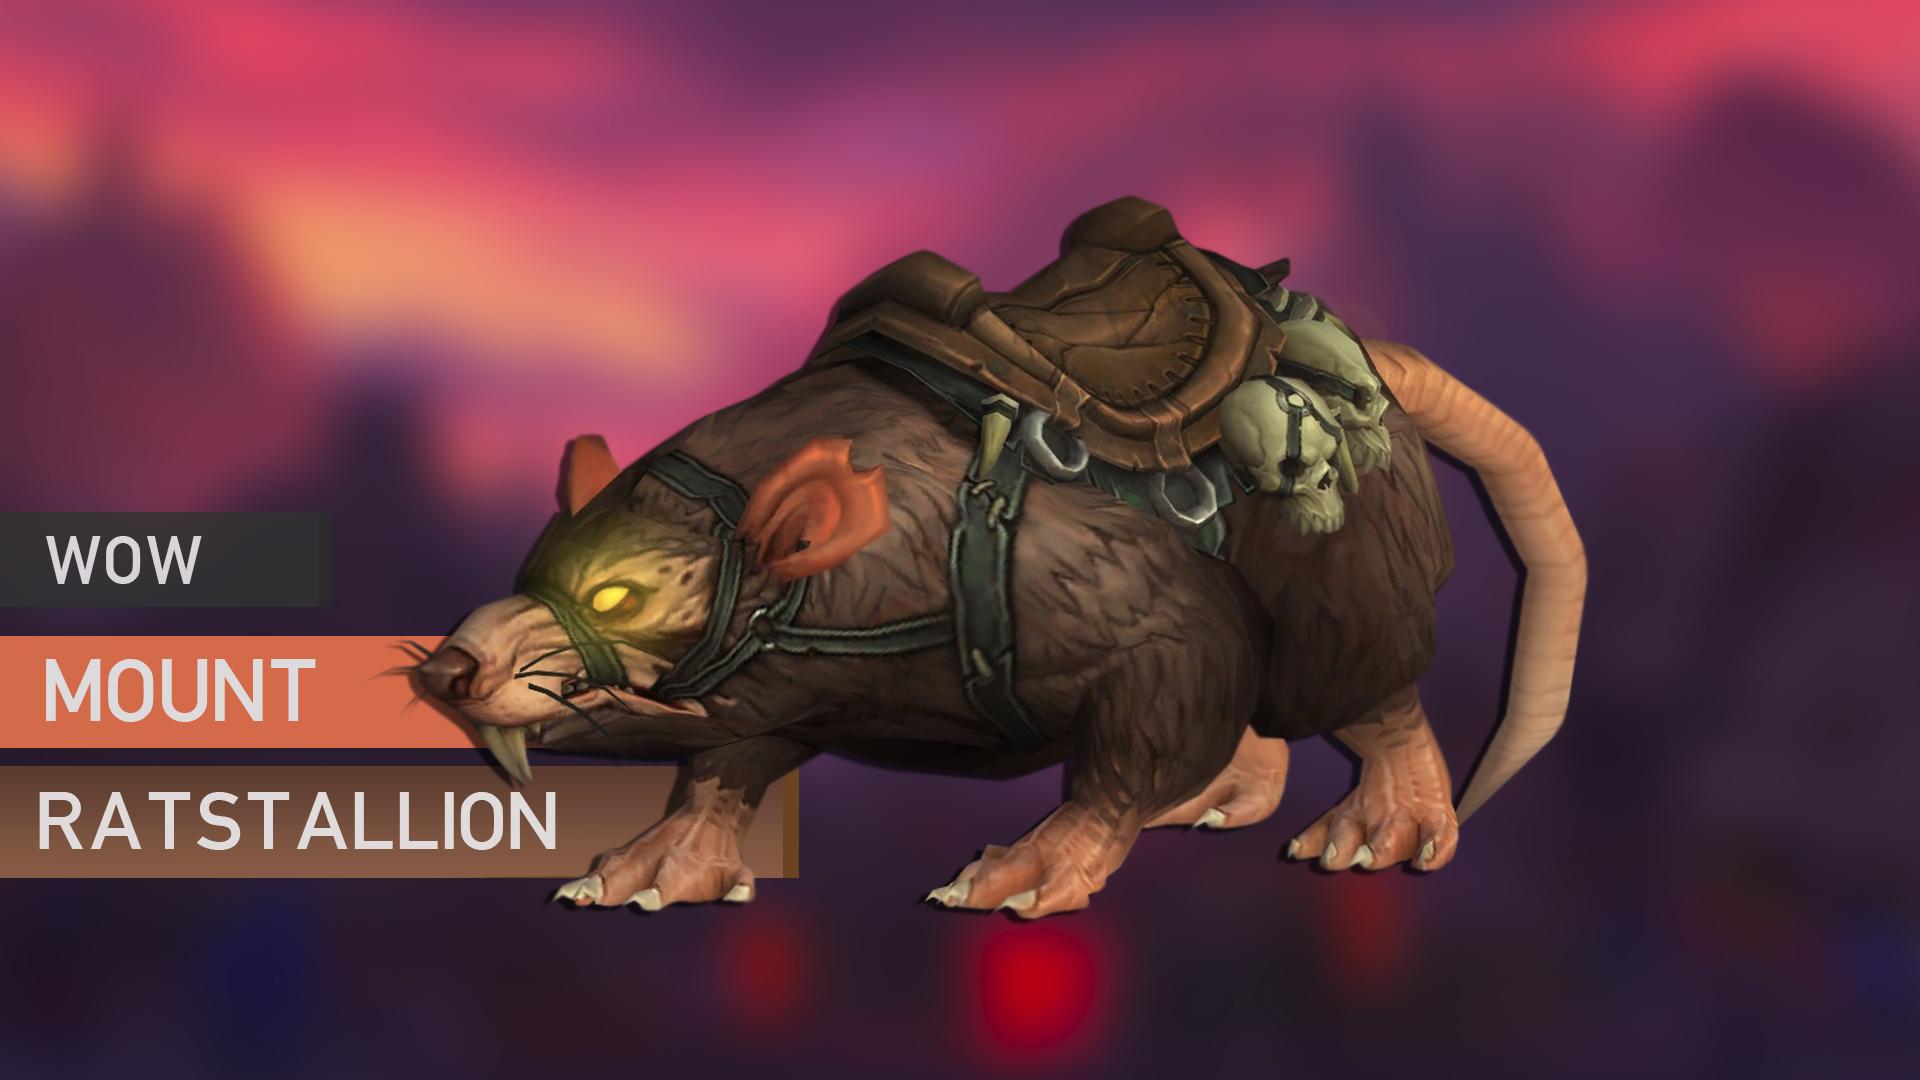 Ratstallion Mount GBD - e2p.com